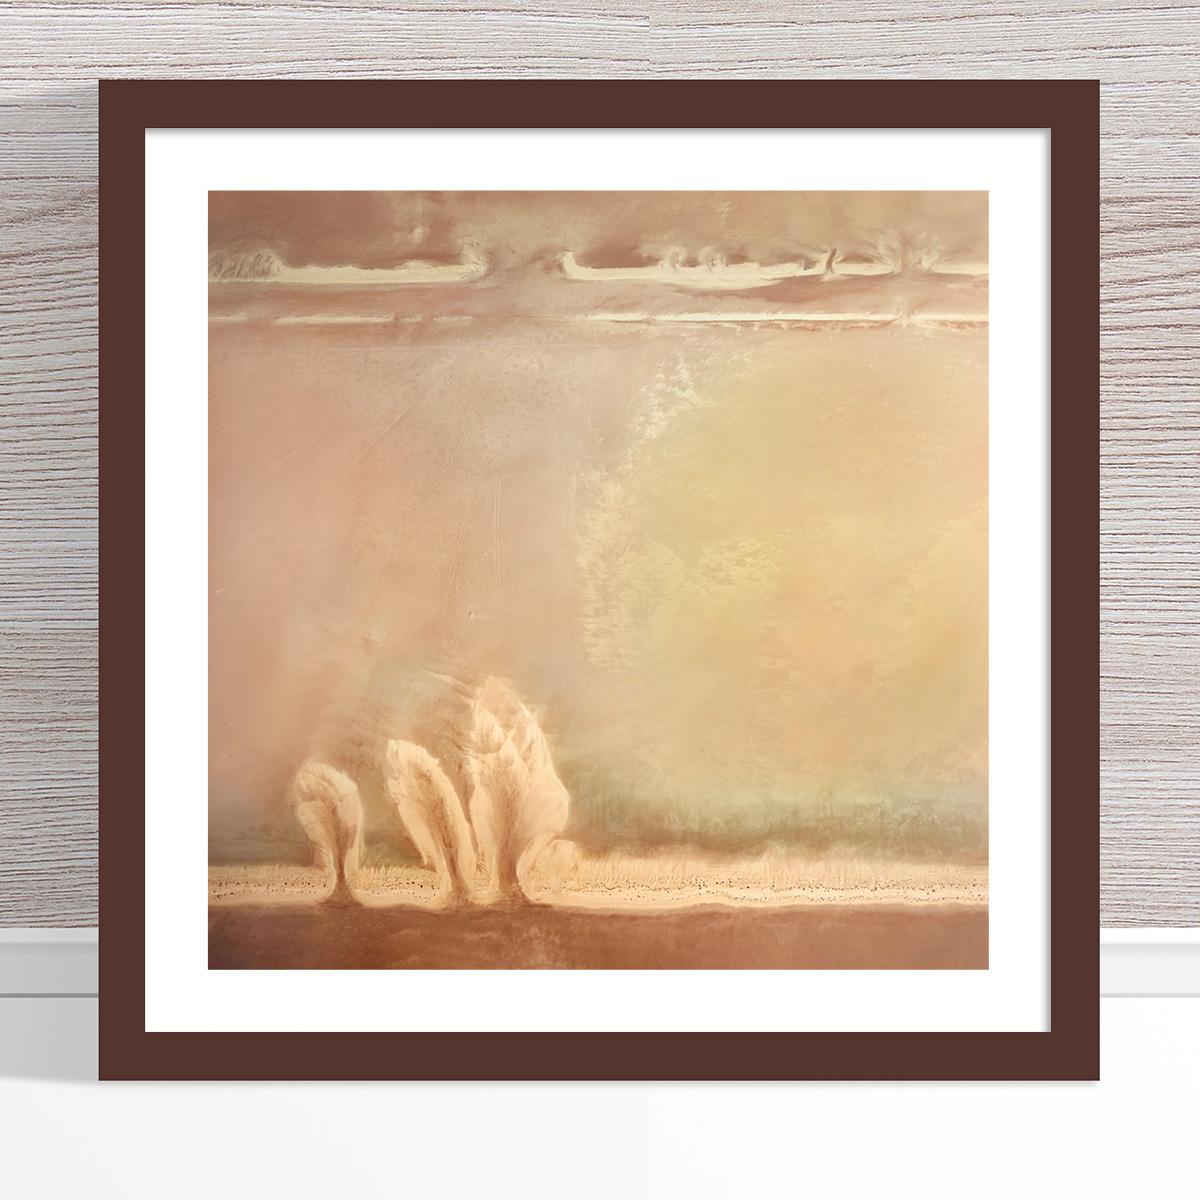 Chris Saunders - 'Aerial Salt 046' Dark Frame